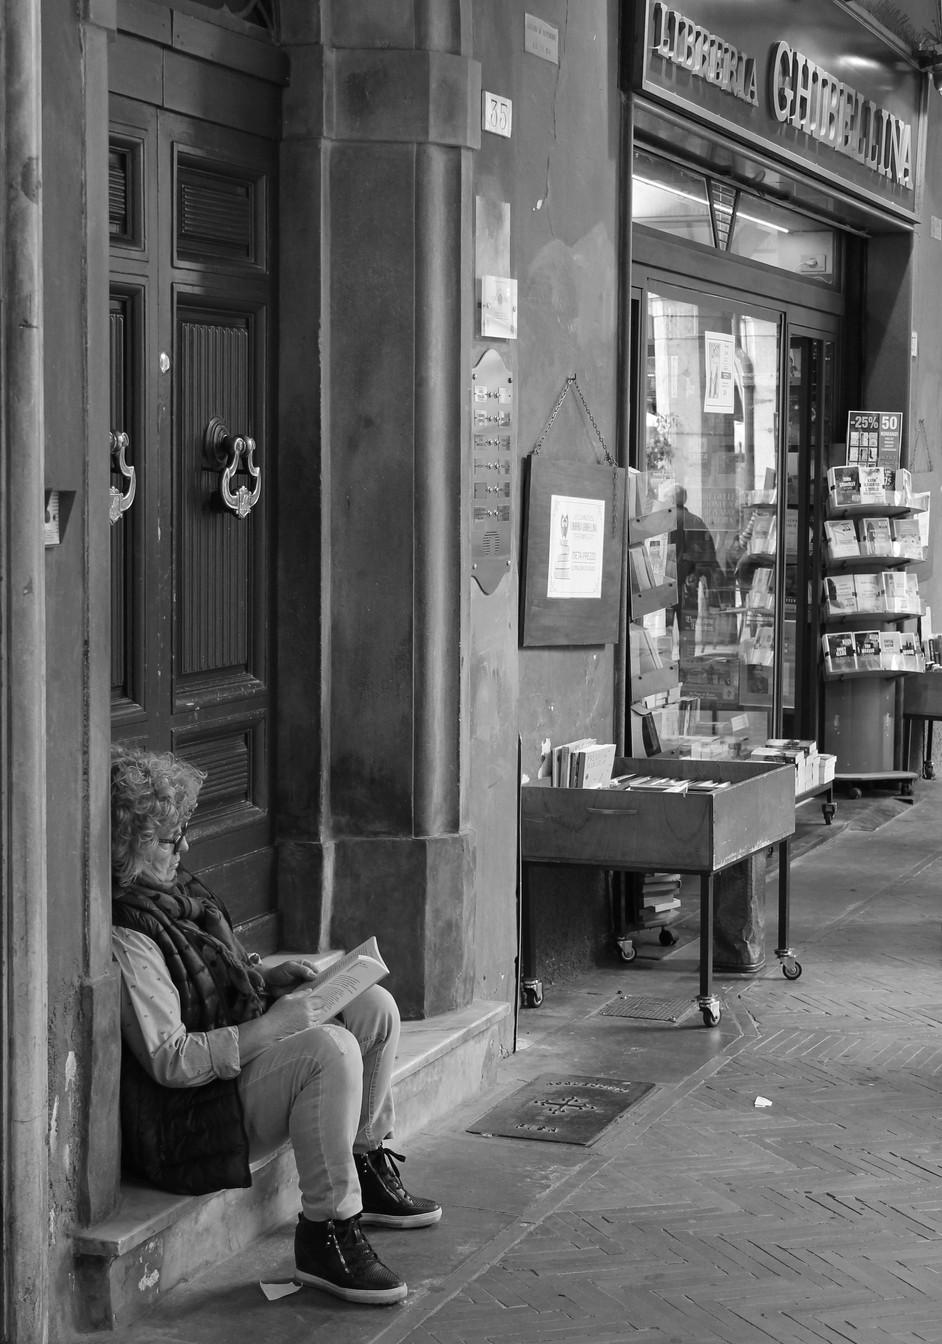 The book store seller in Pisa